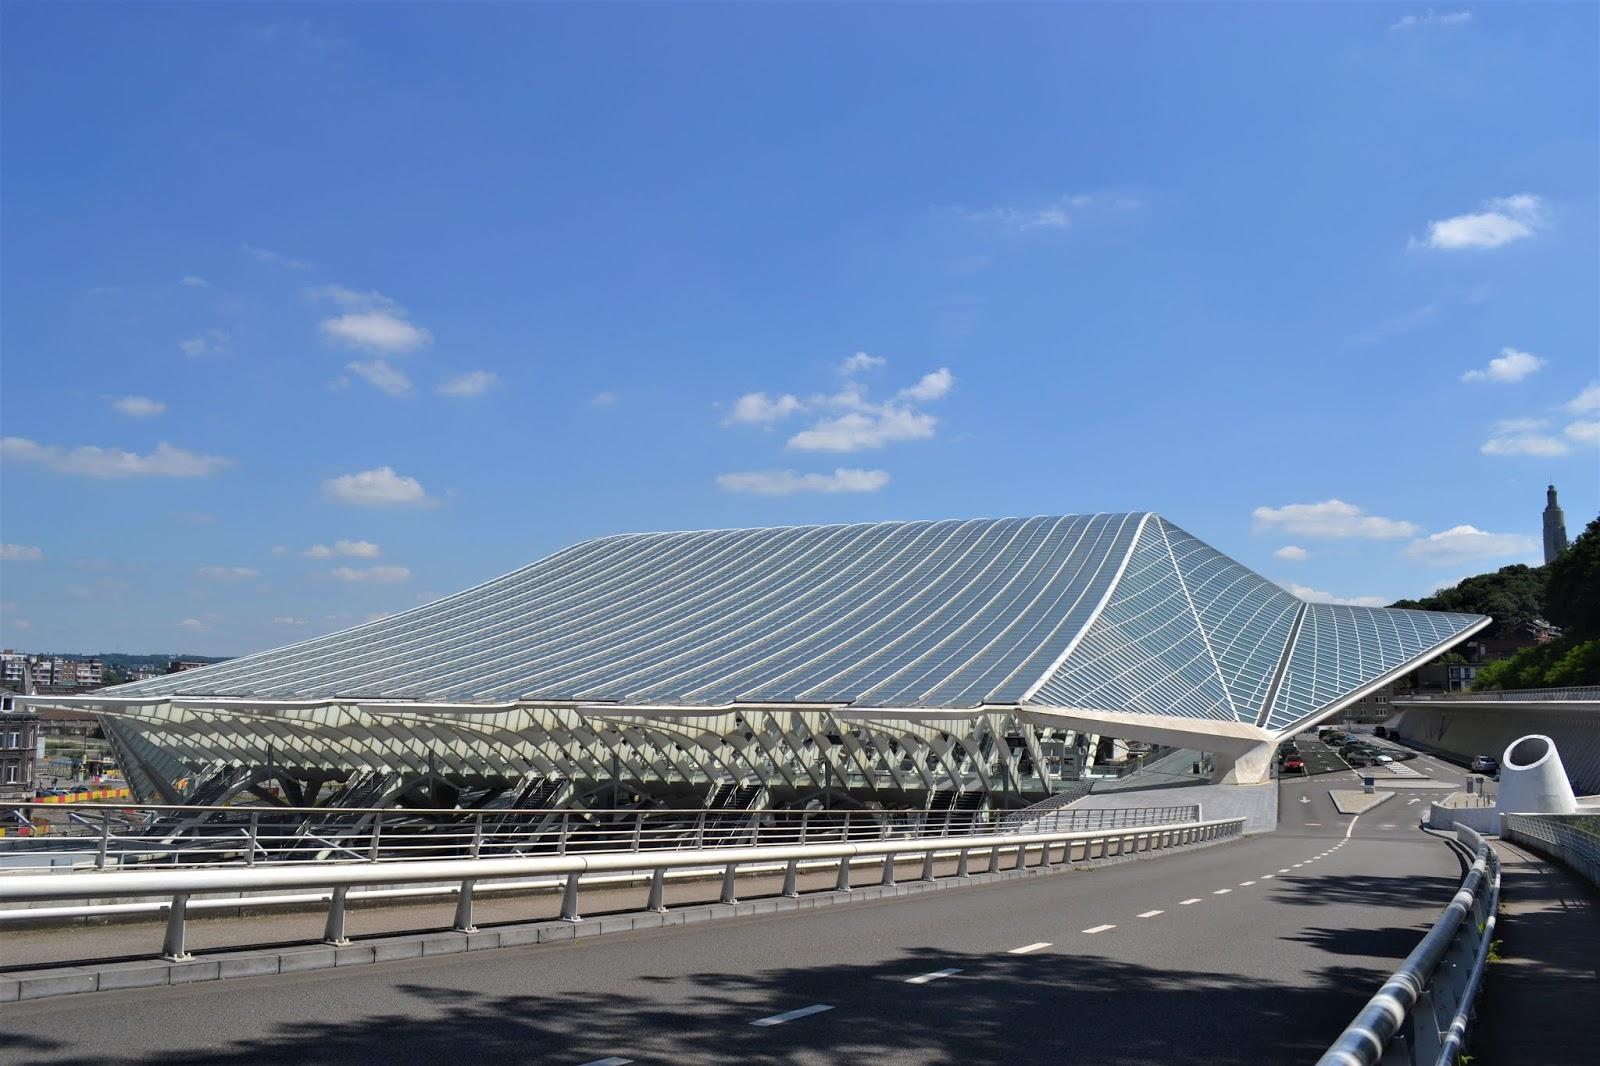 Stazione TGV Santiago Calatrava